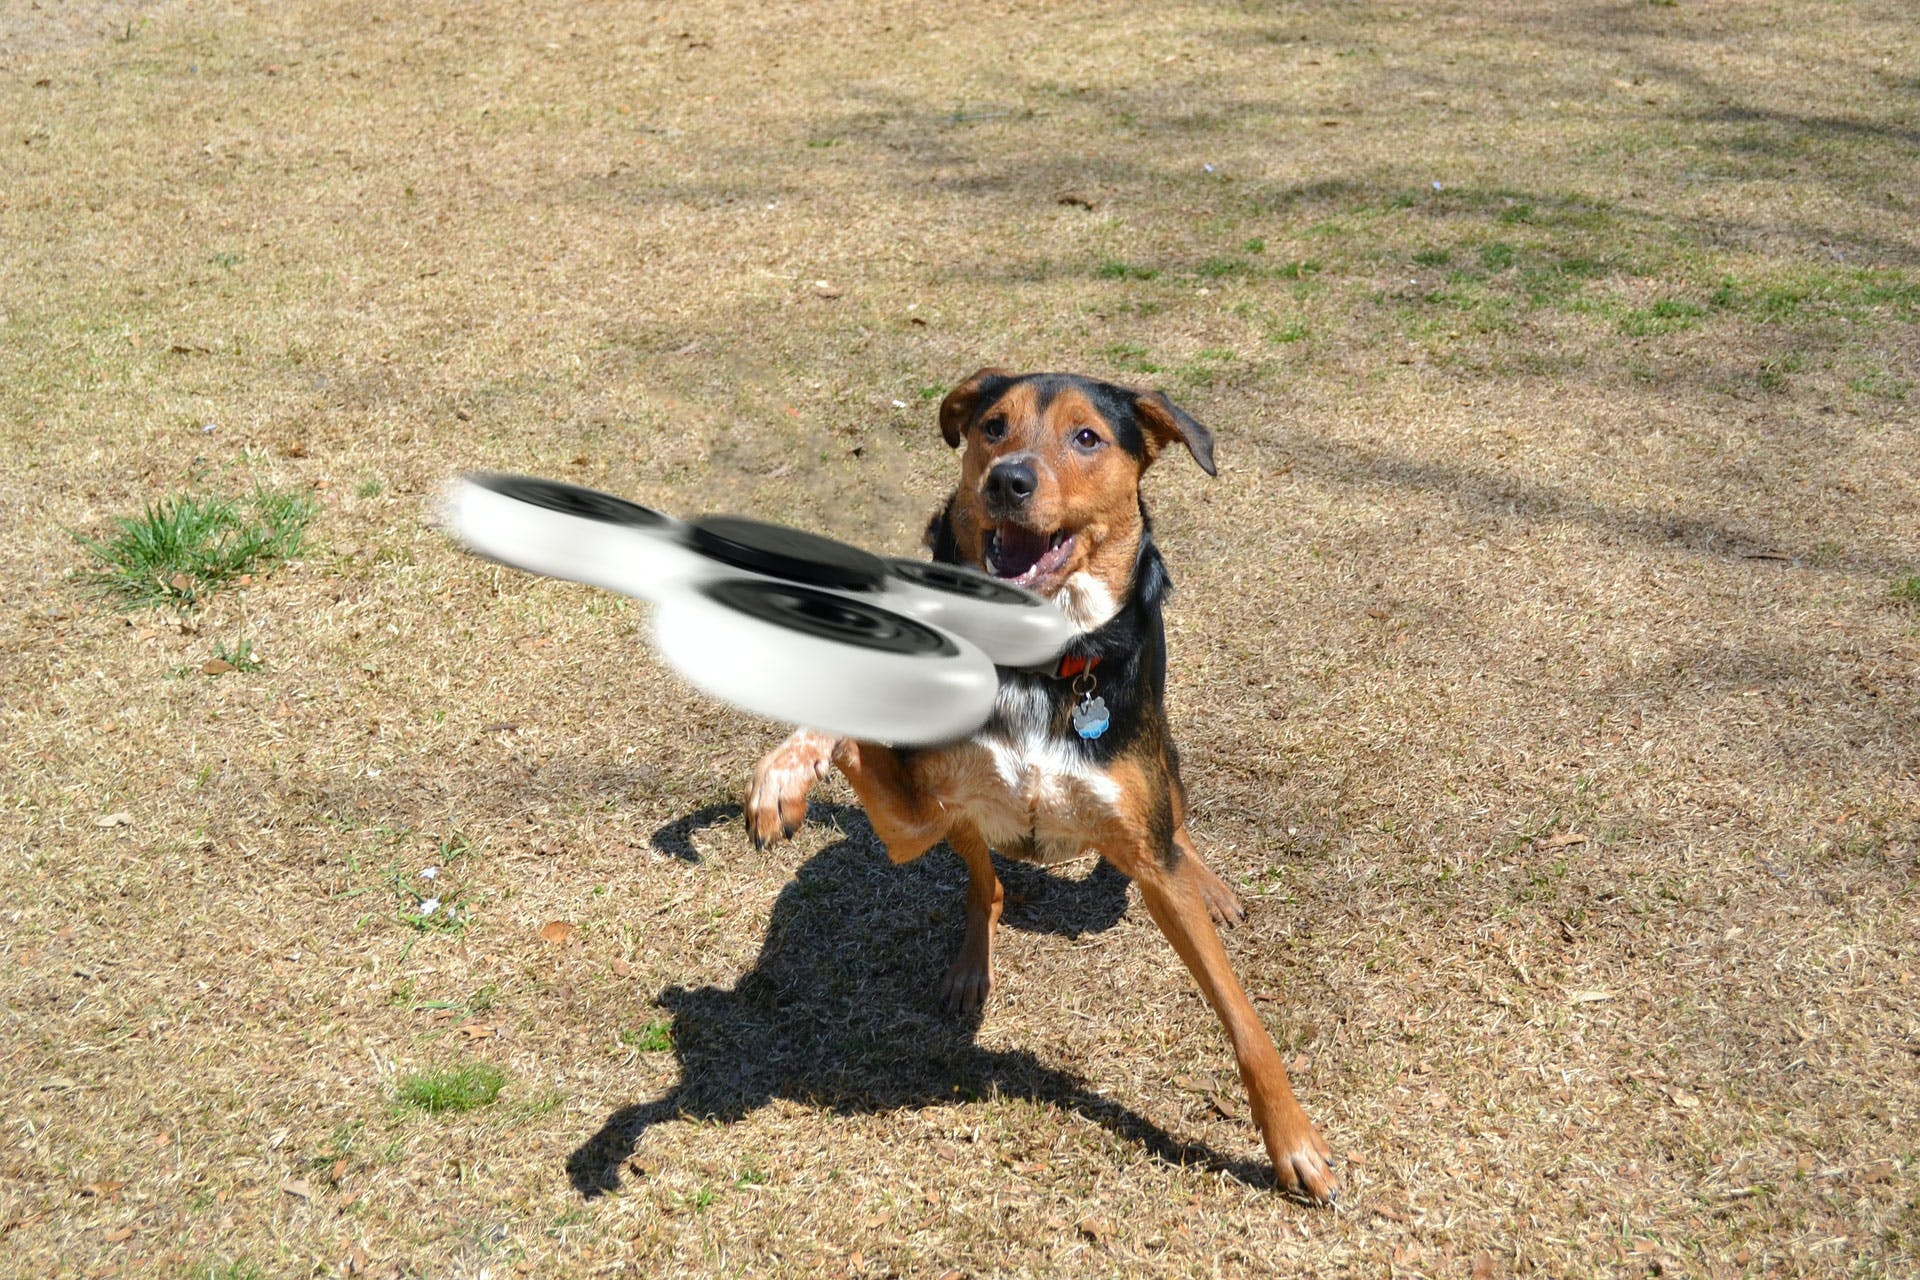 Dog catching a fidget spinner